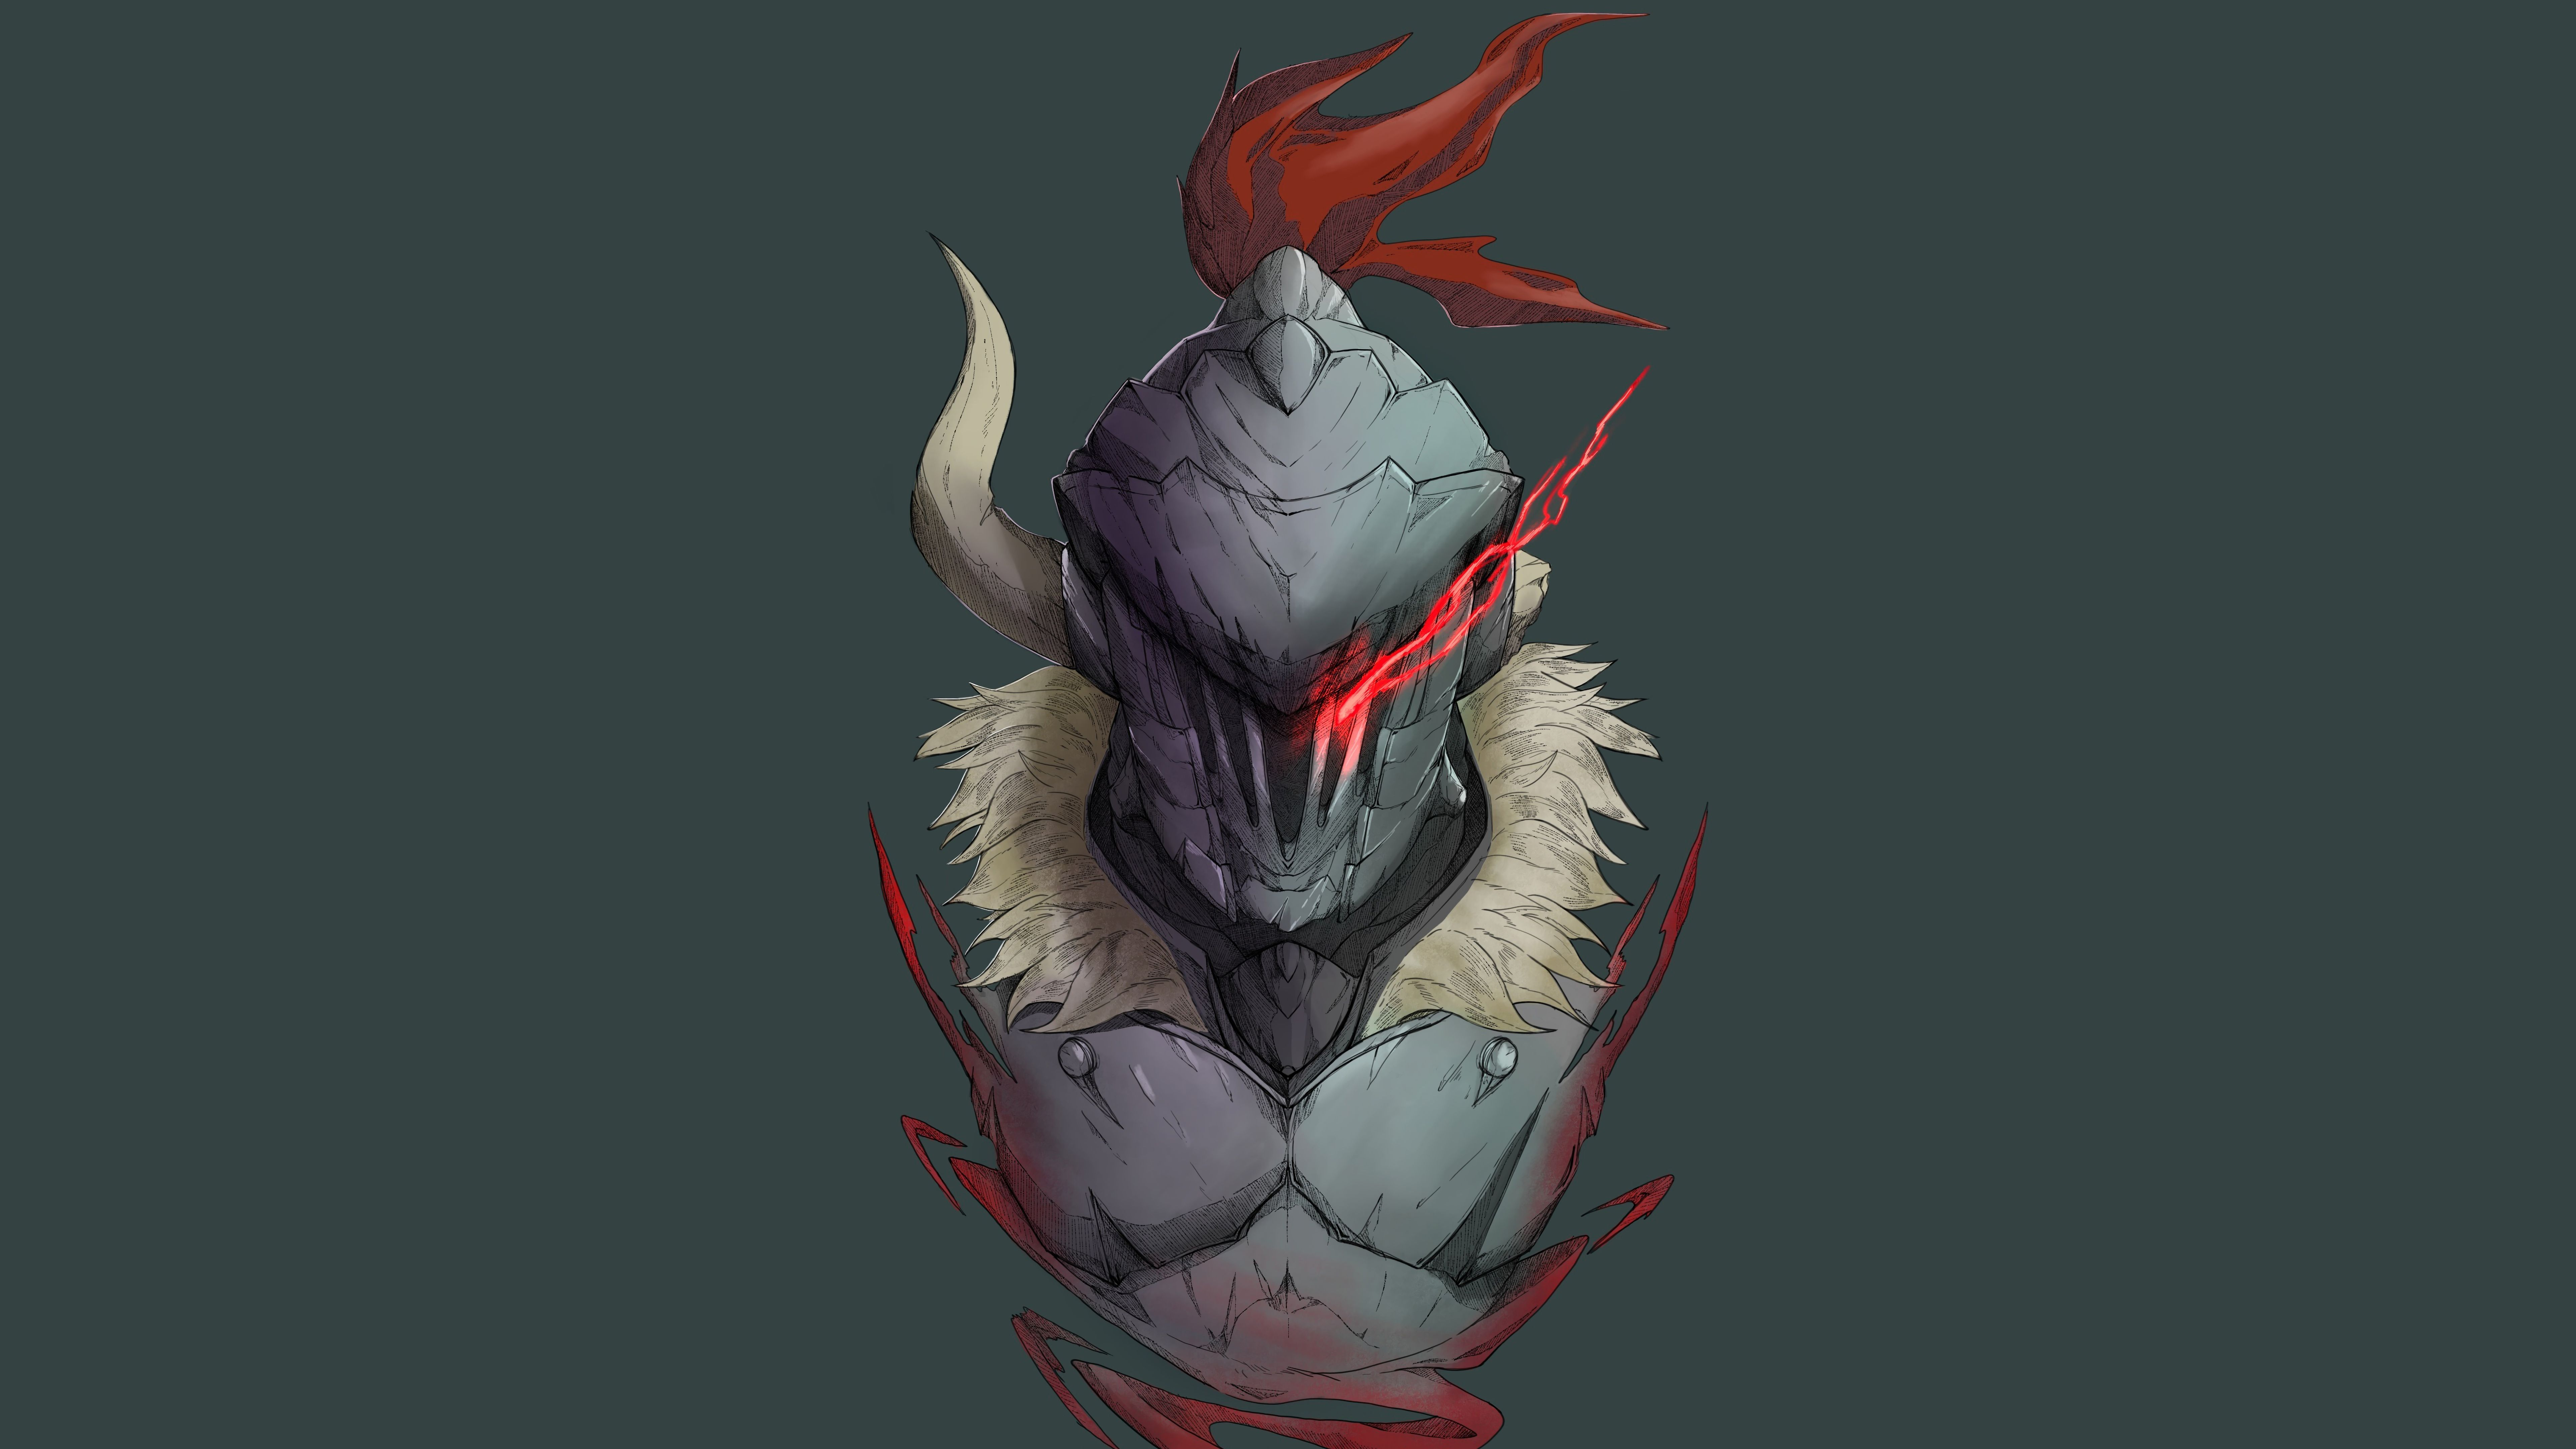 Goblin Slayer 8K 26888 Goblin, Slayer, Anime